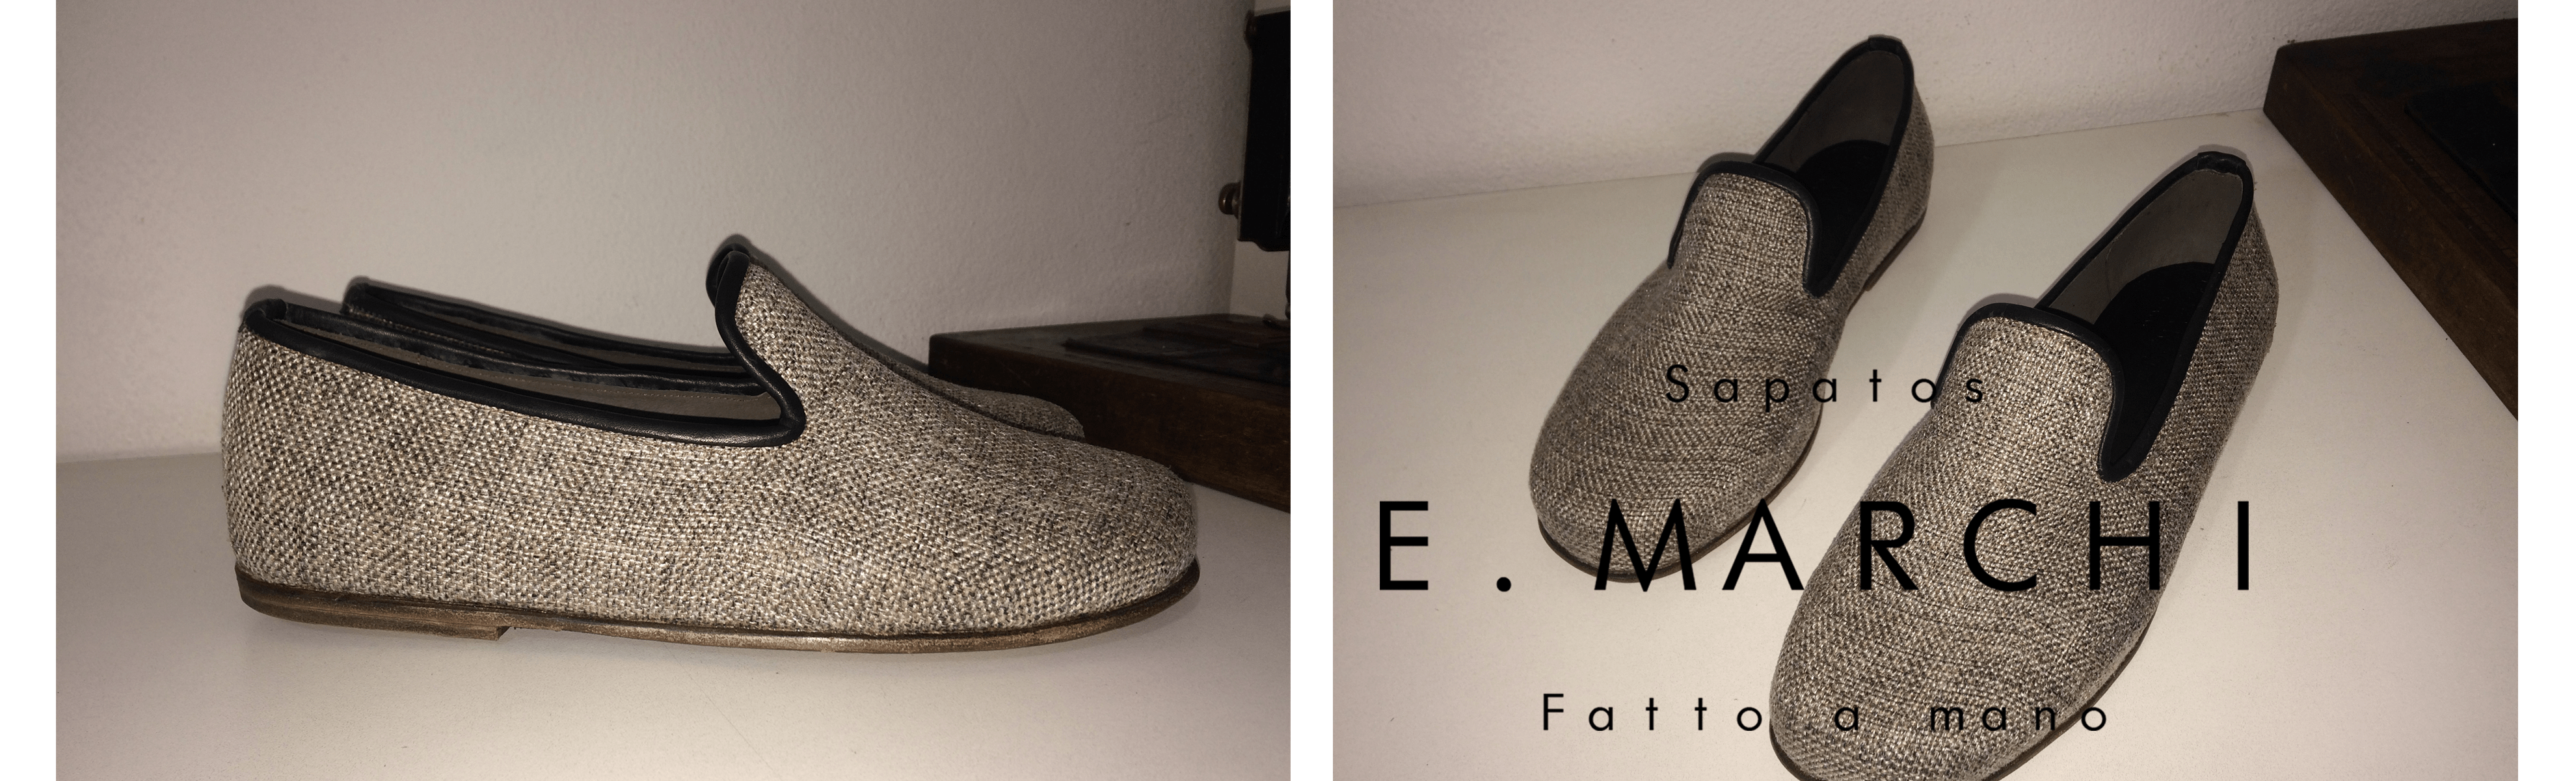 Loafer Positano